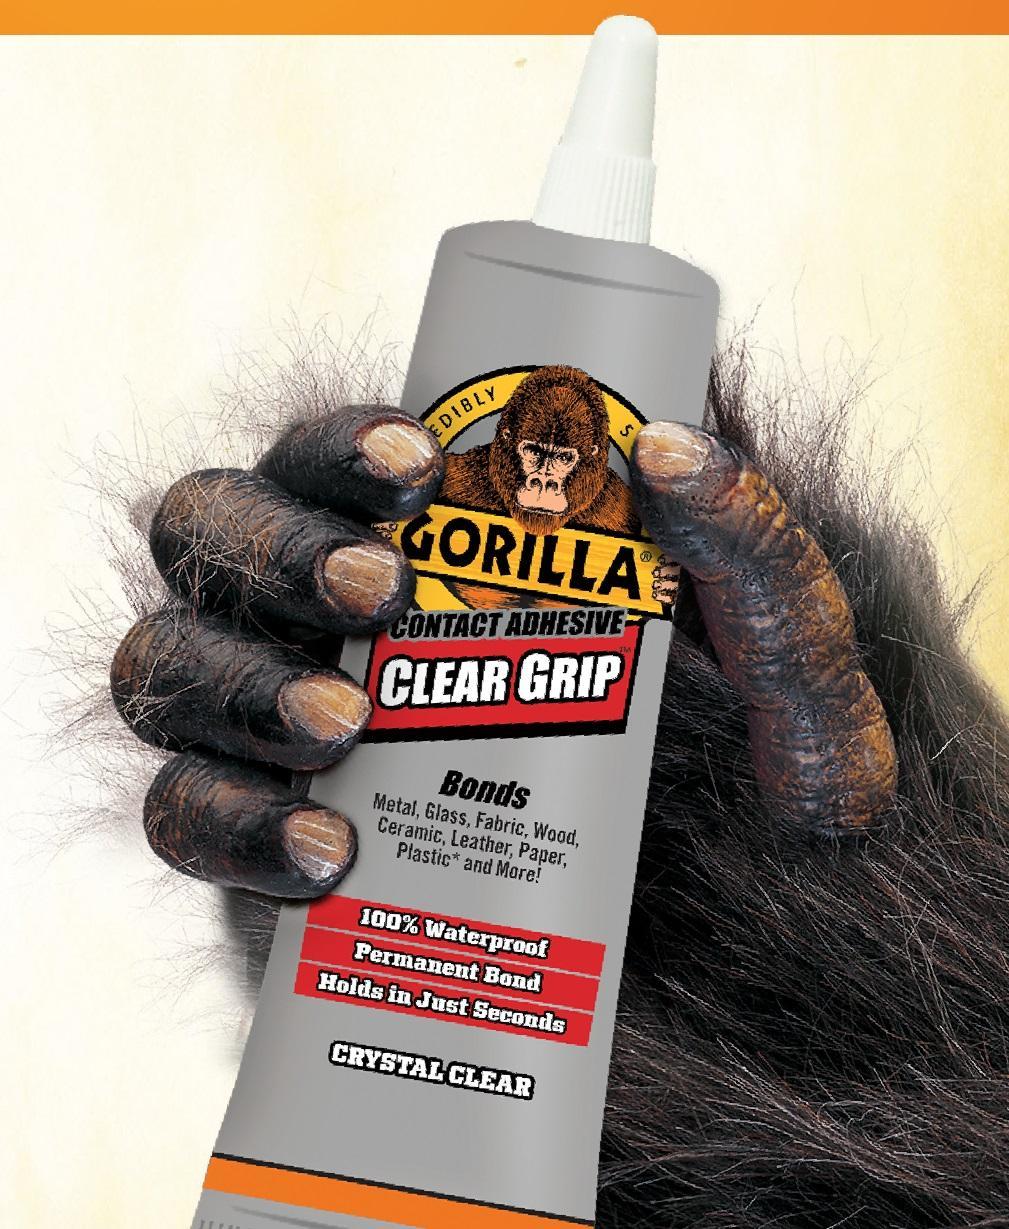 amazon com gorilla 8040001 clear grip contact adhesive 3 oz